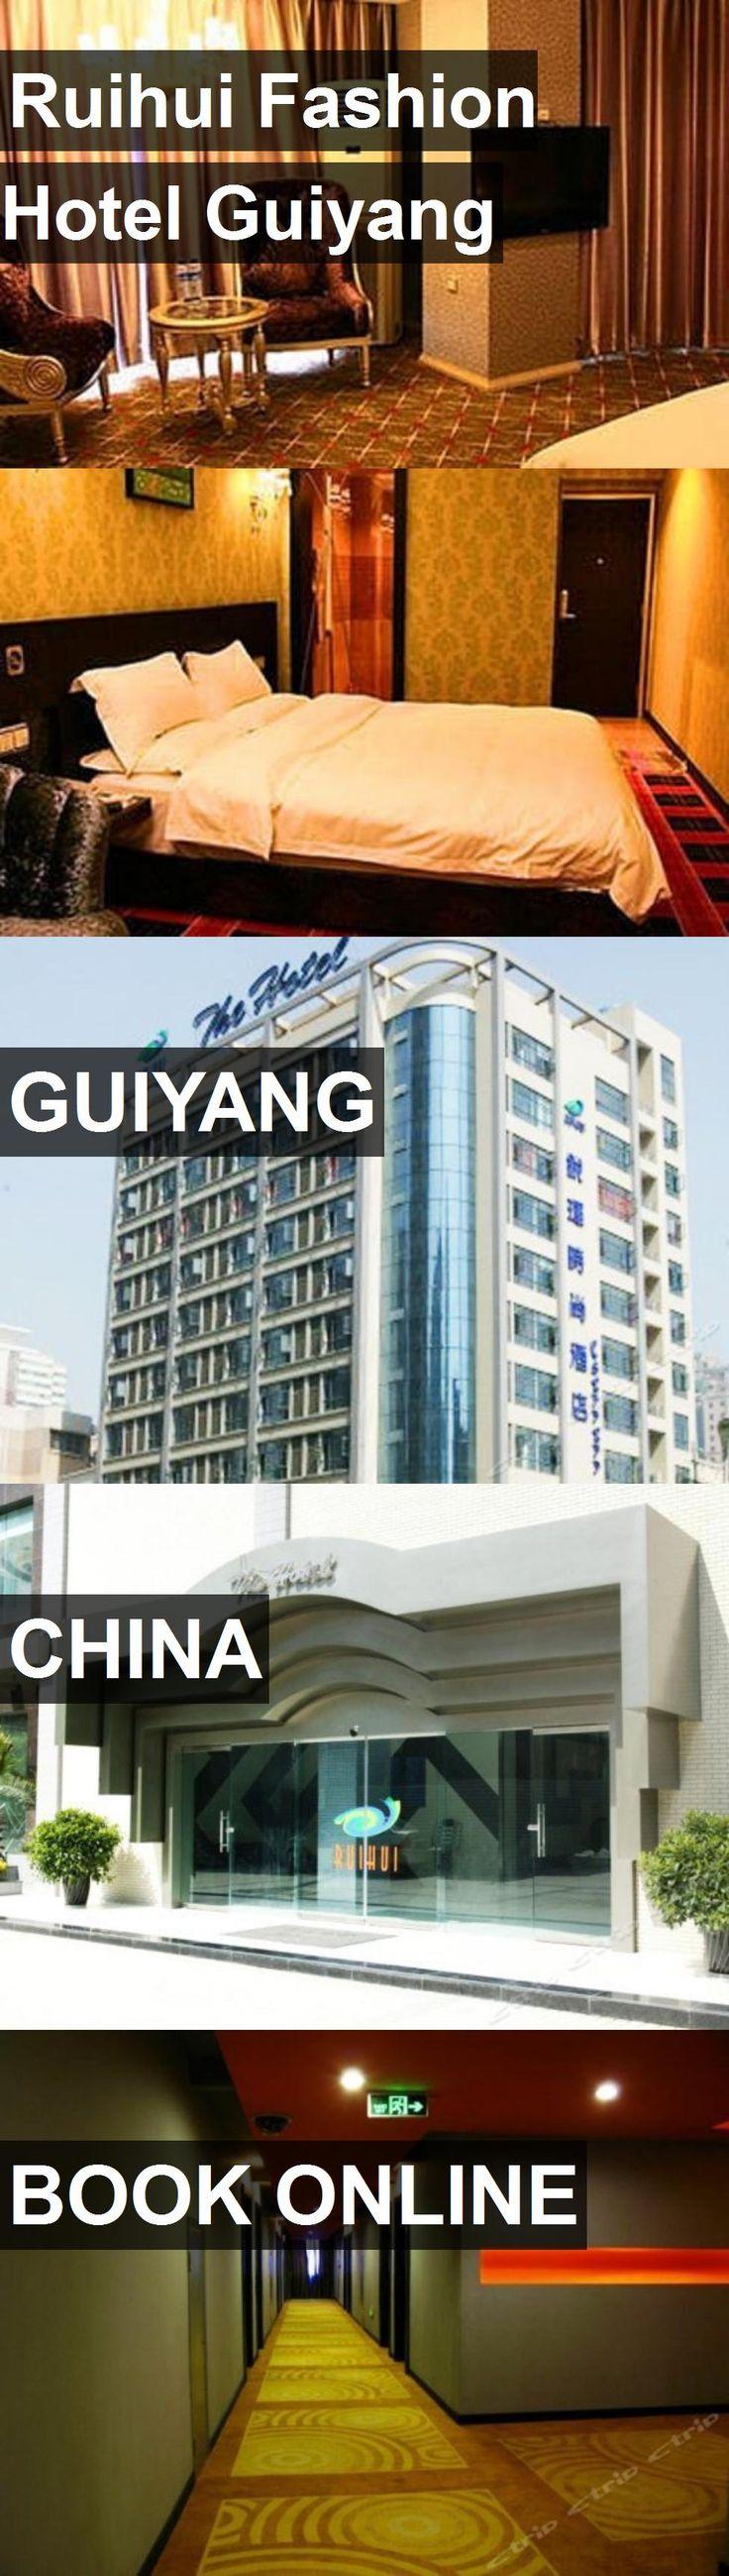 Hotel Ruihui Fashion Hotel Guiyang in Guiyang, China. For more information, photos, reviews and best prices please follow the link. #China #Guiyang #hotel #travel #vacation